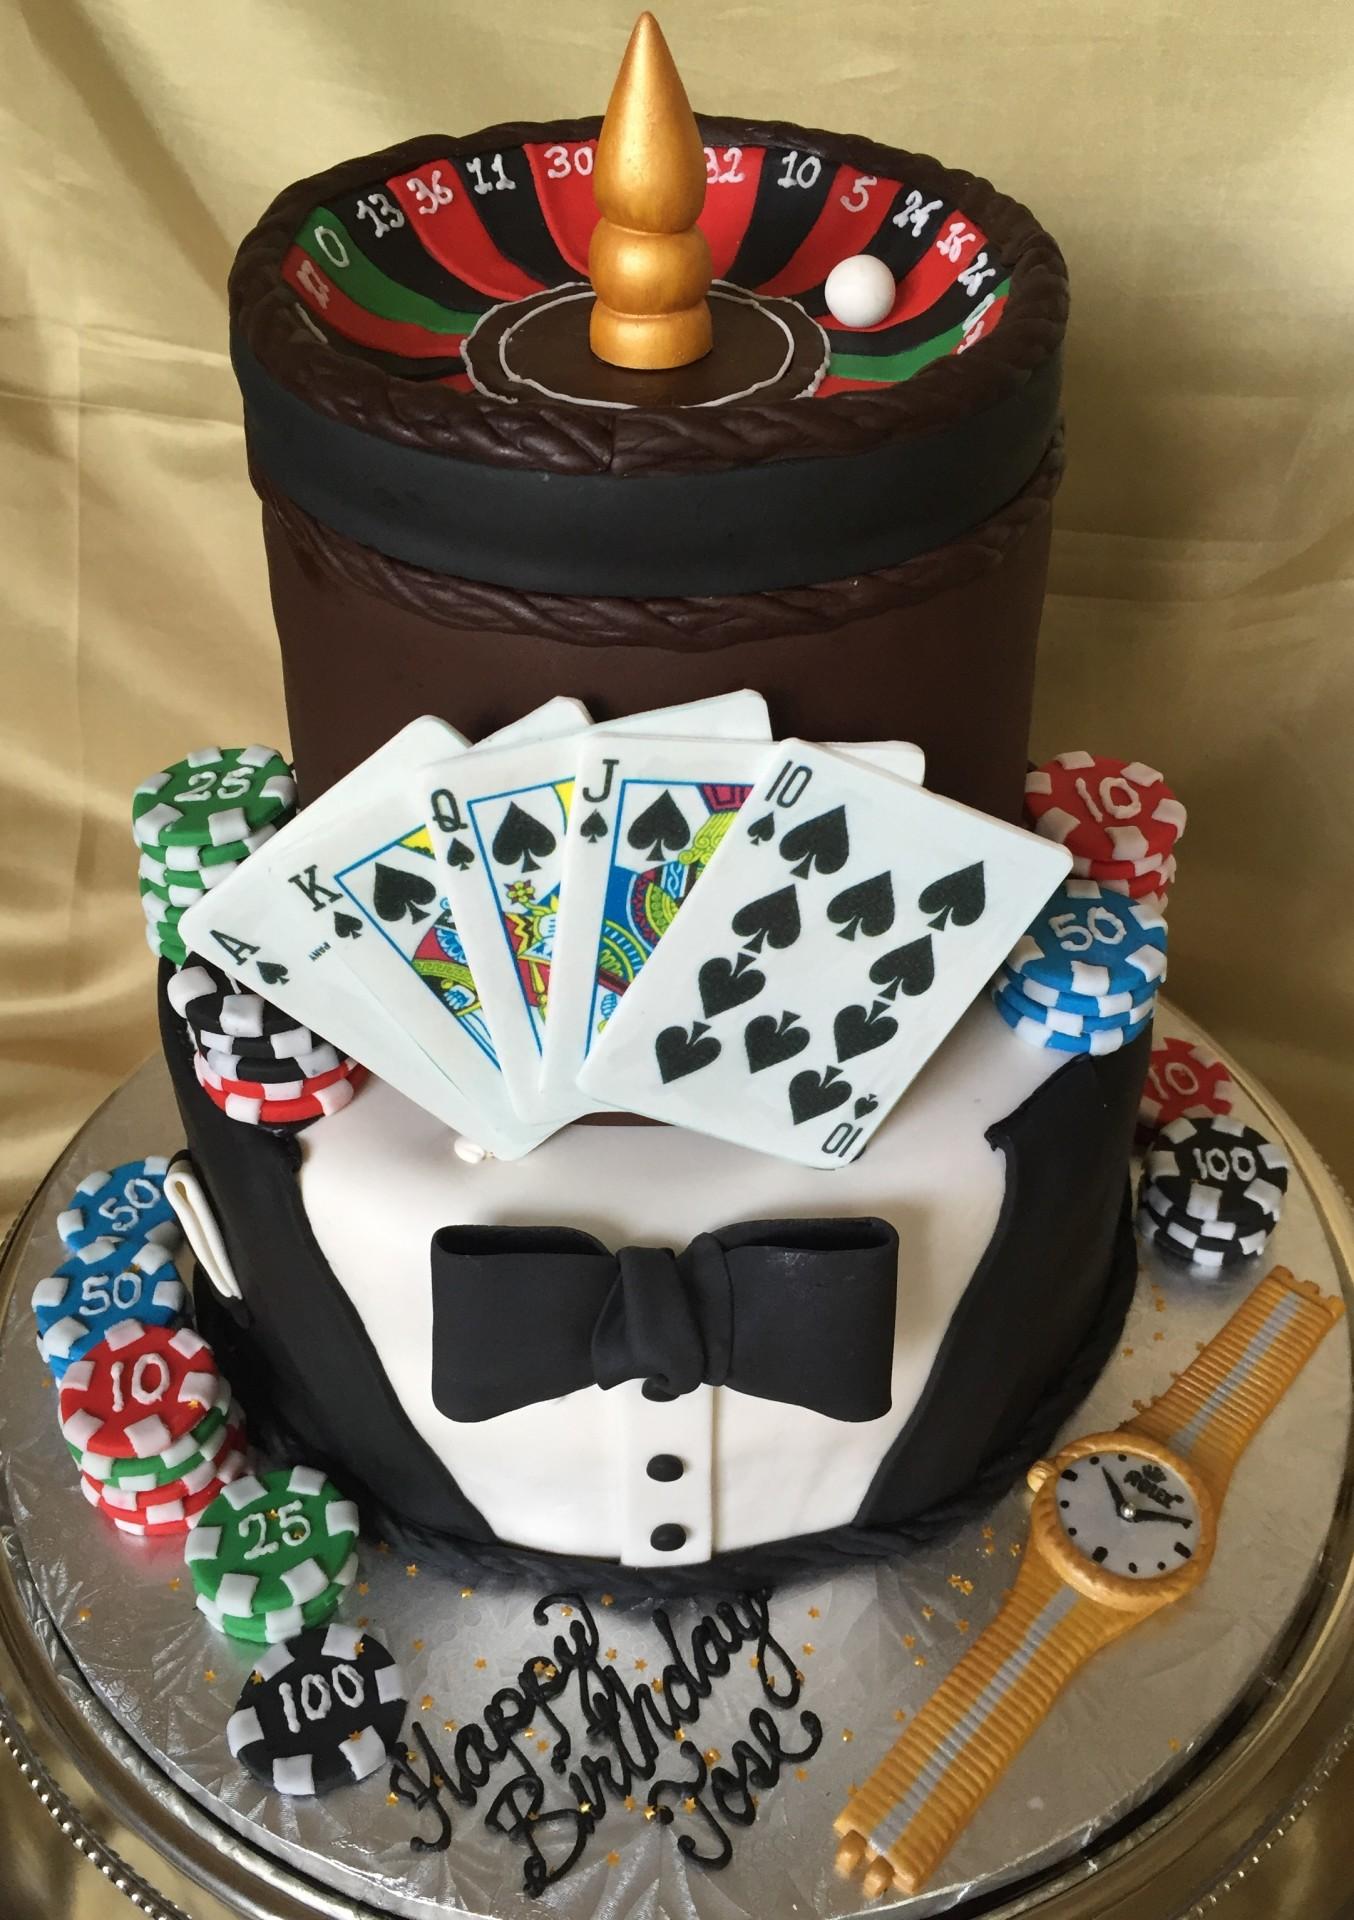 Casino theme cake,tuxedo cake, blackjack cake,poker cake